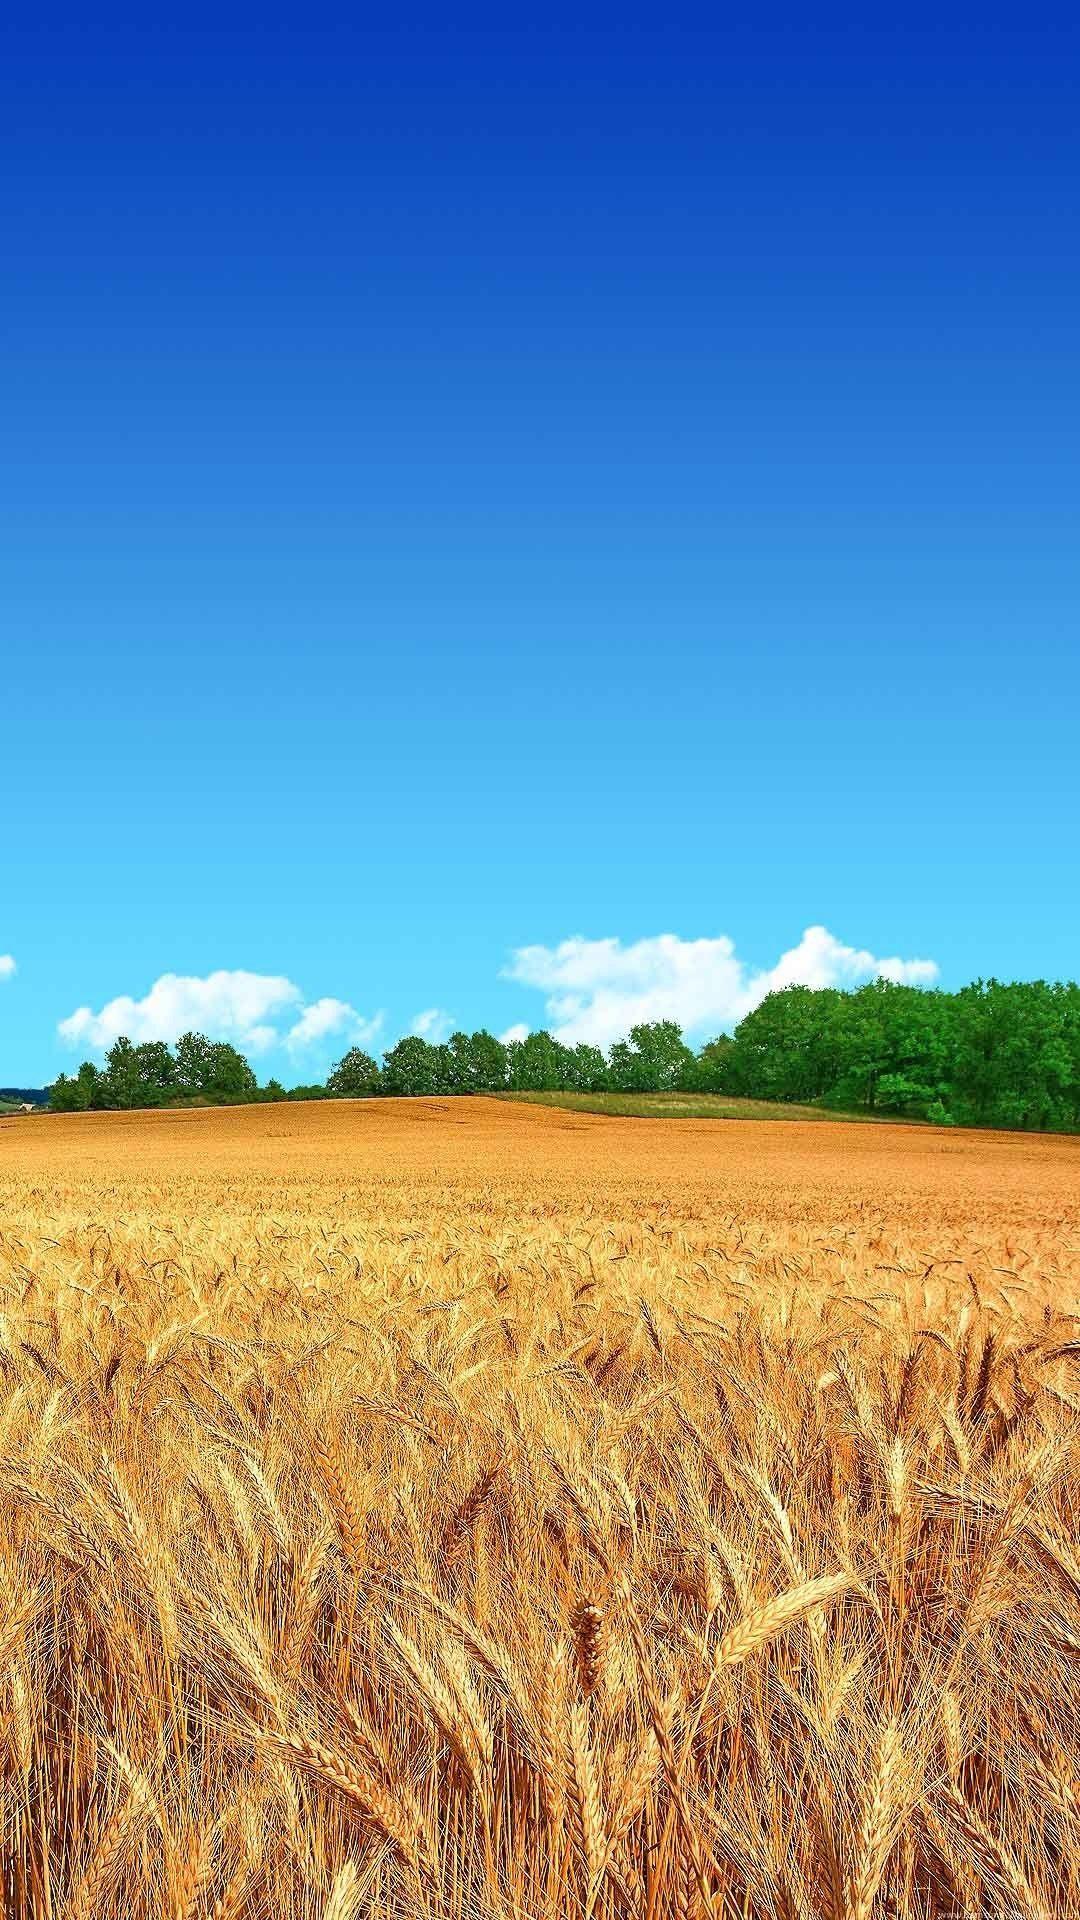 Wheat Field Clear Blue Sky HD Wallpaper NiceBlueSkys